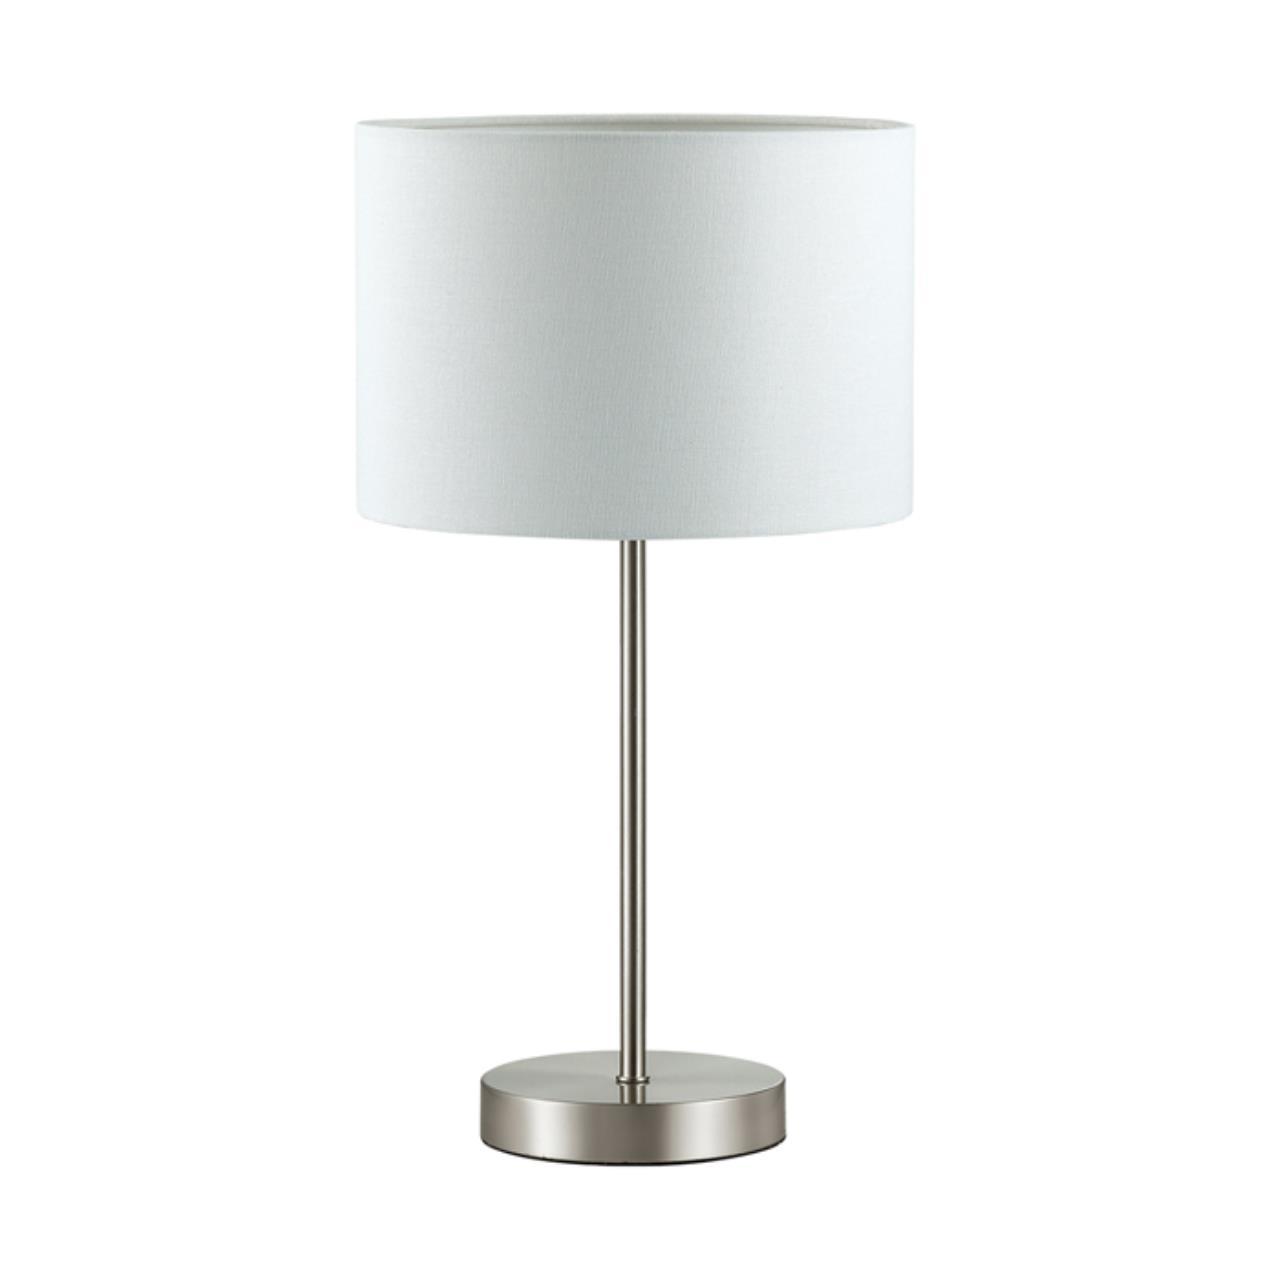 3745/1T MODERNI LN19 86 никель Настольная лампа E27 1*60W 220V NIKKI